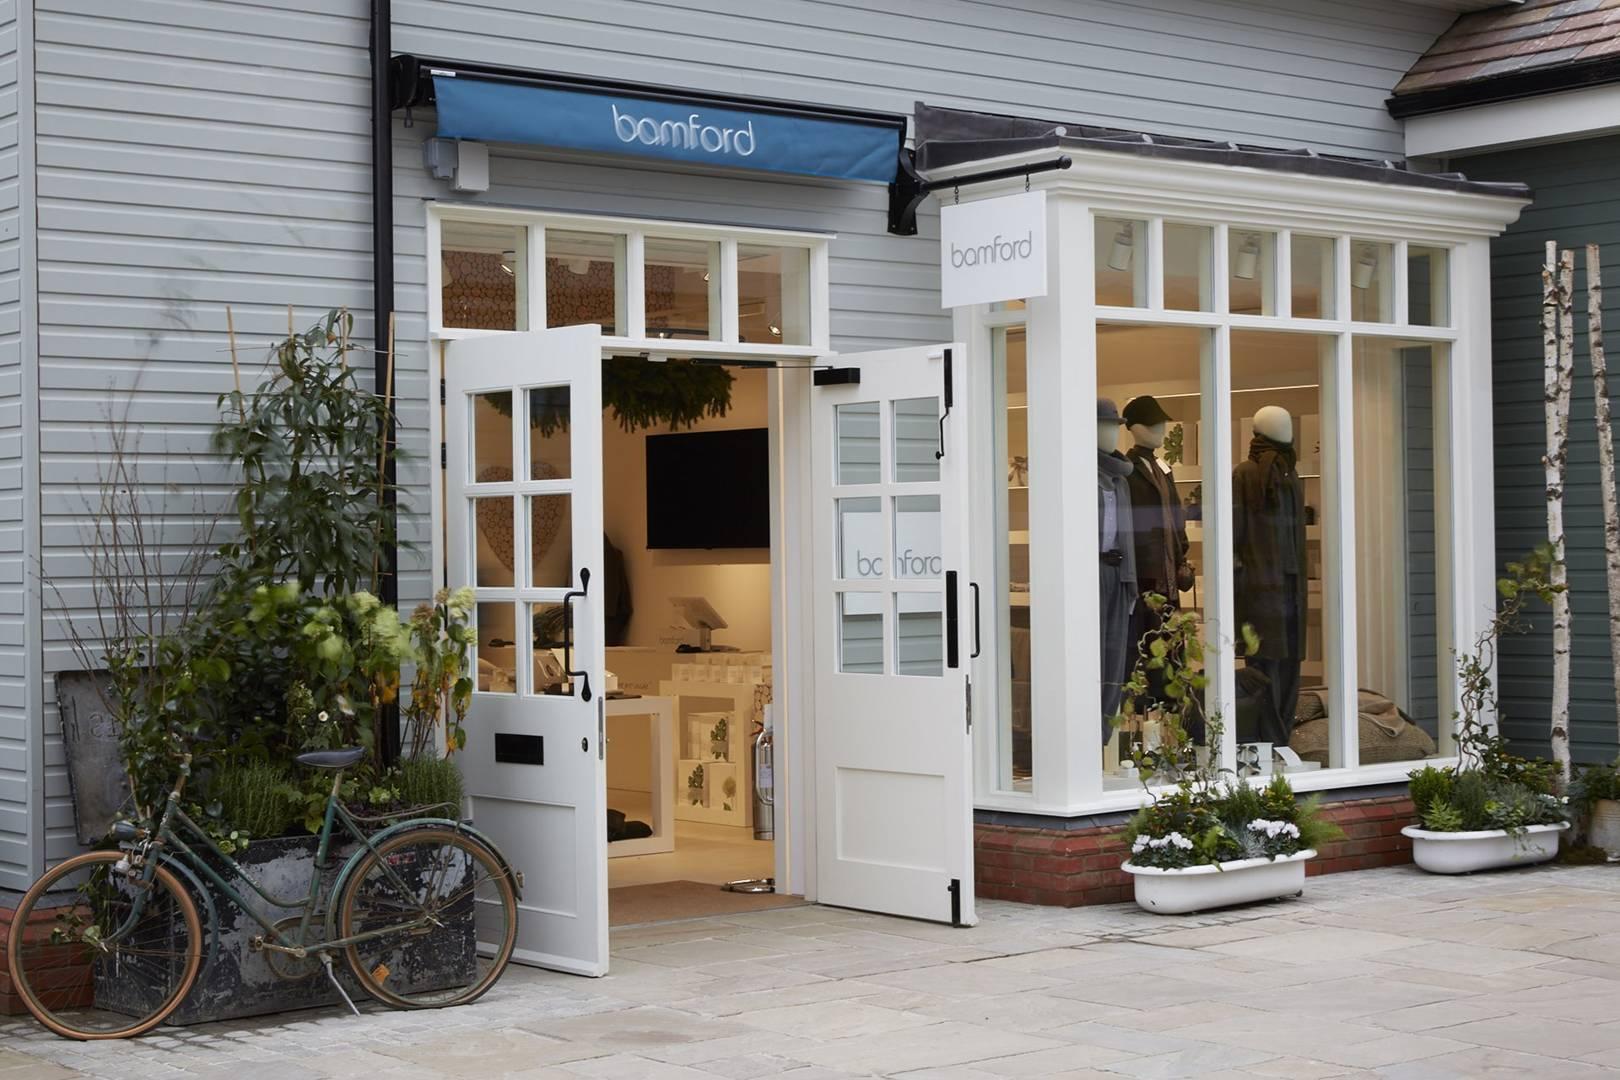 Best designer outlet shopping in the UK  3b5c7526b76b9